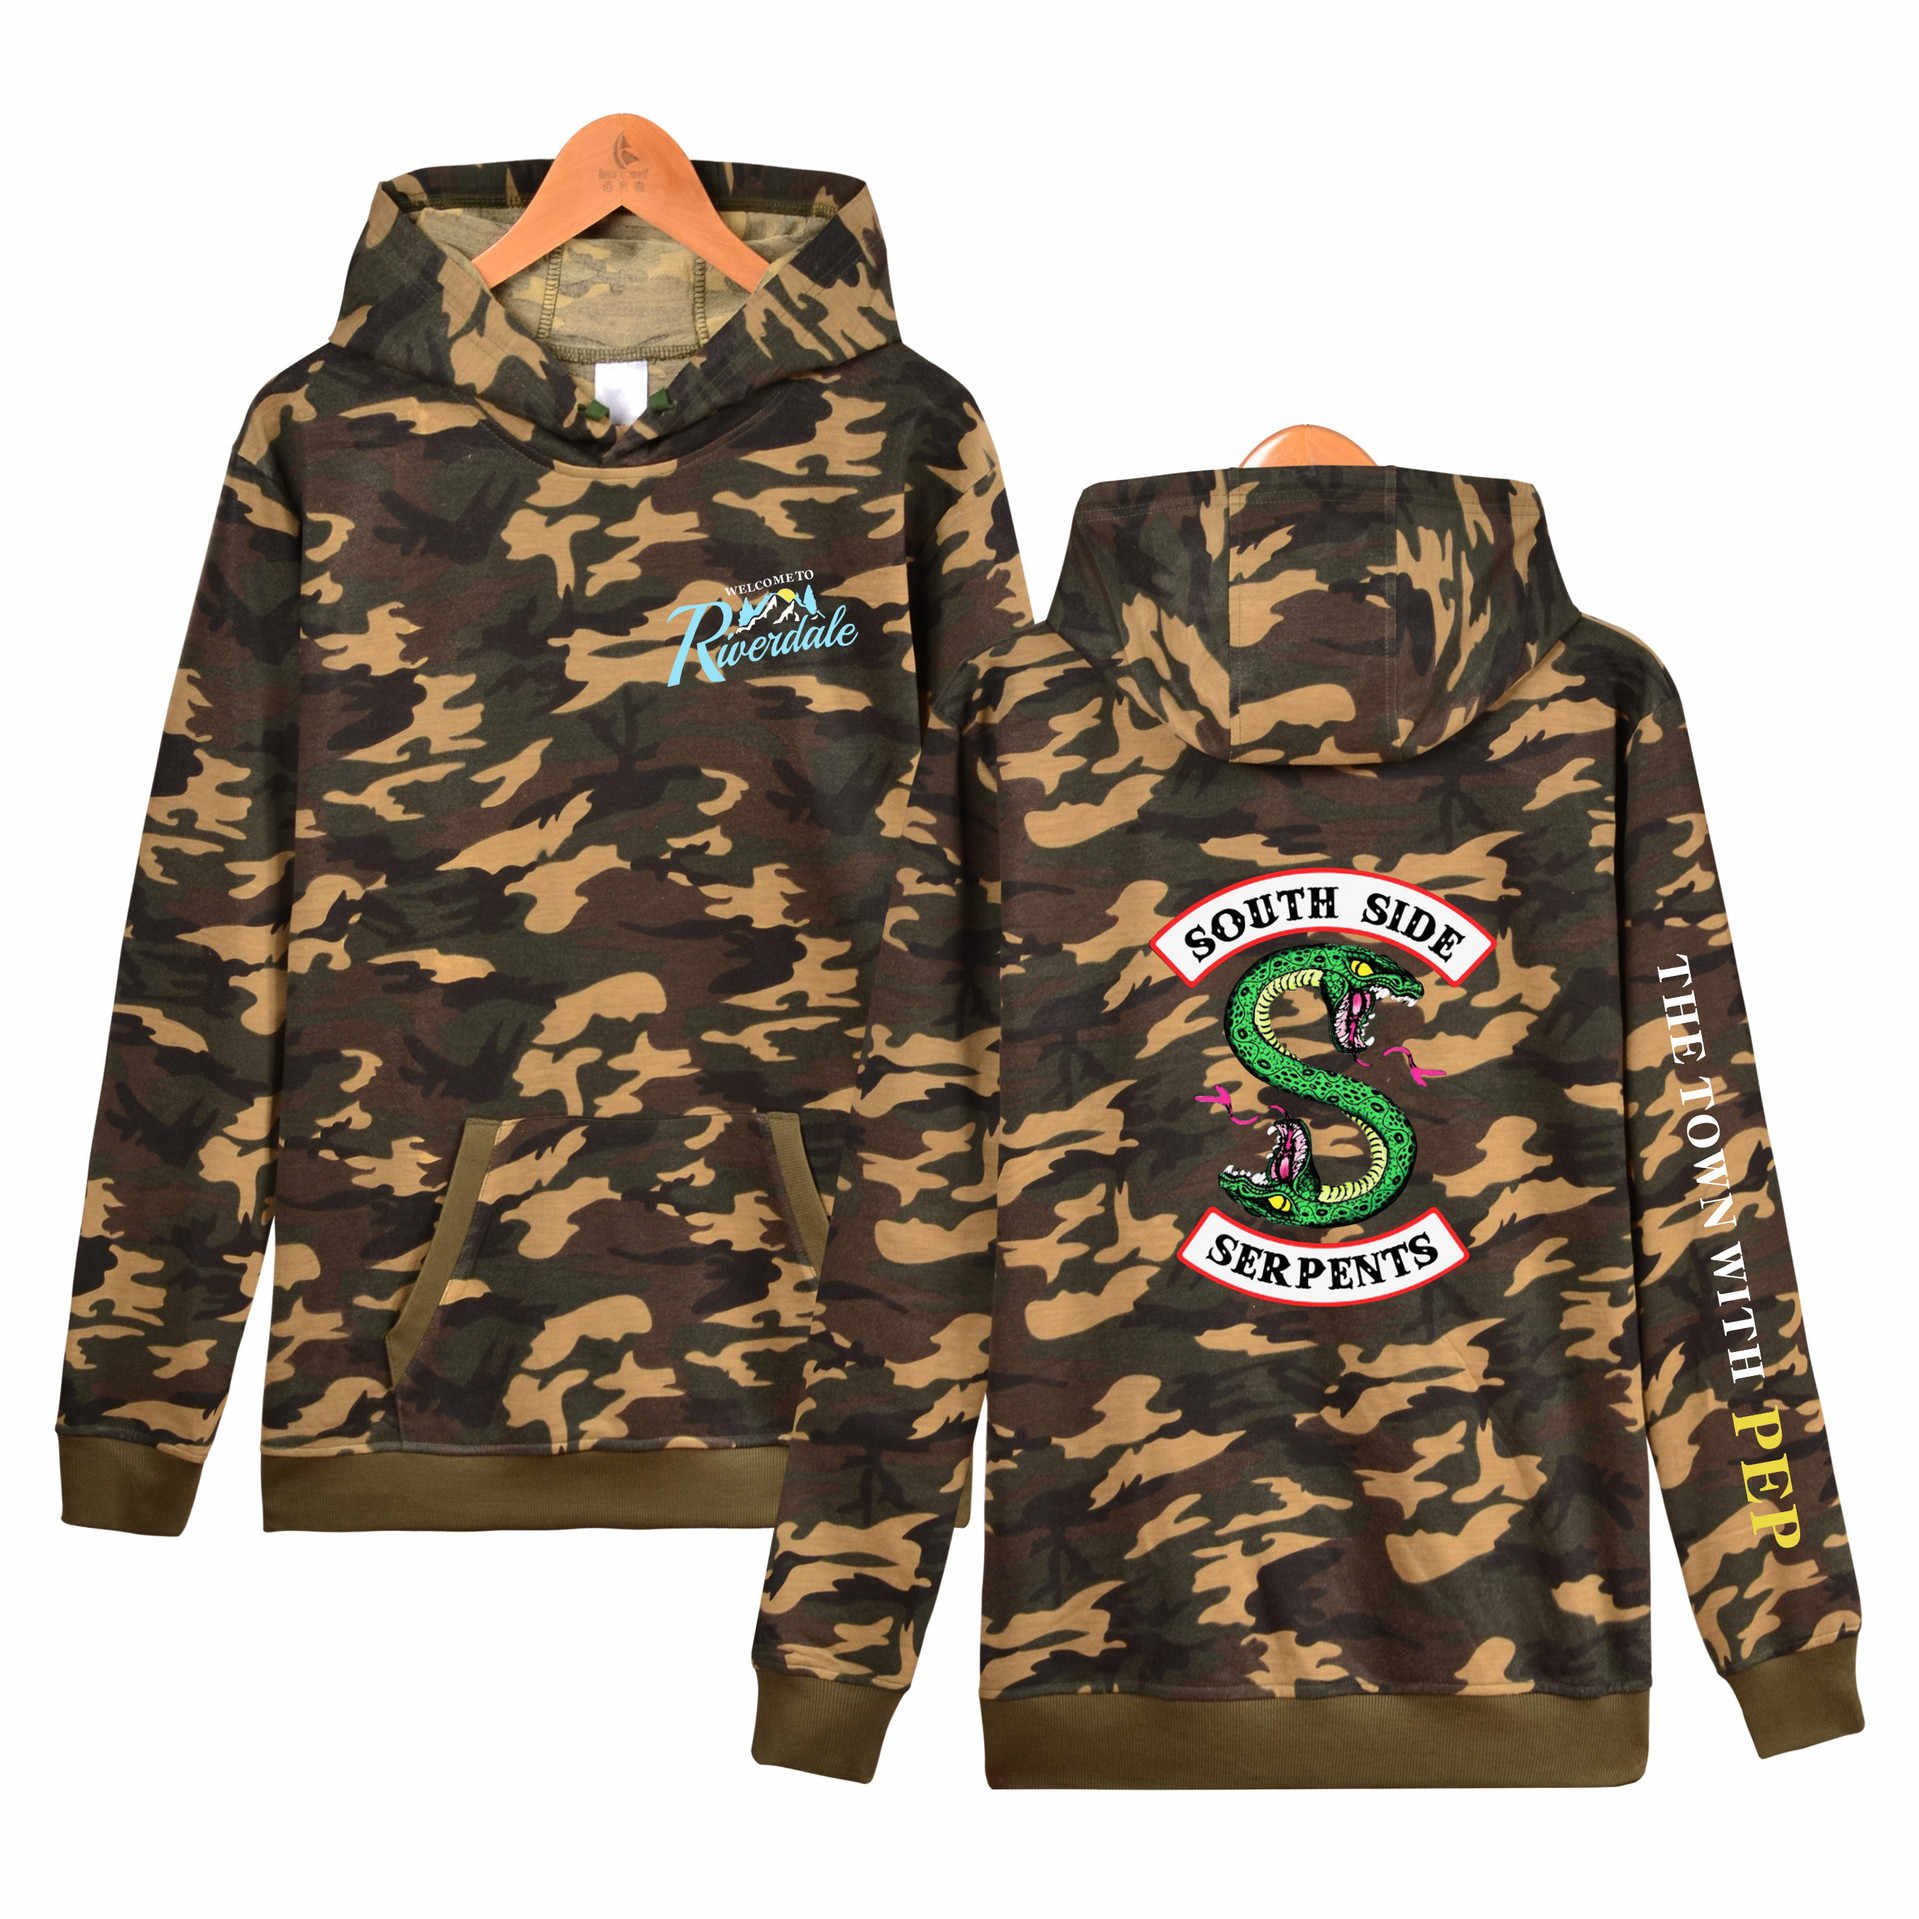 2018 riverdale serpents baumwolle Hoodies sweatshirts männer frauen Pullover south side serpents Kleidung Sweatshirt Jacke mantel